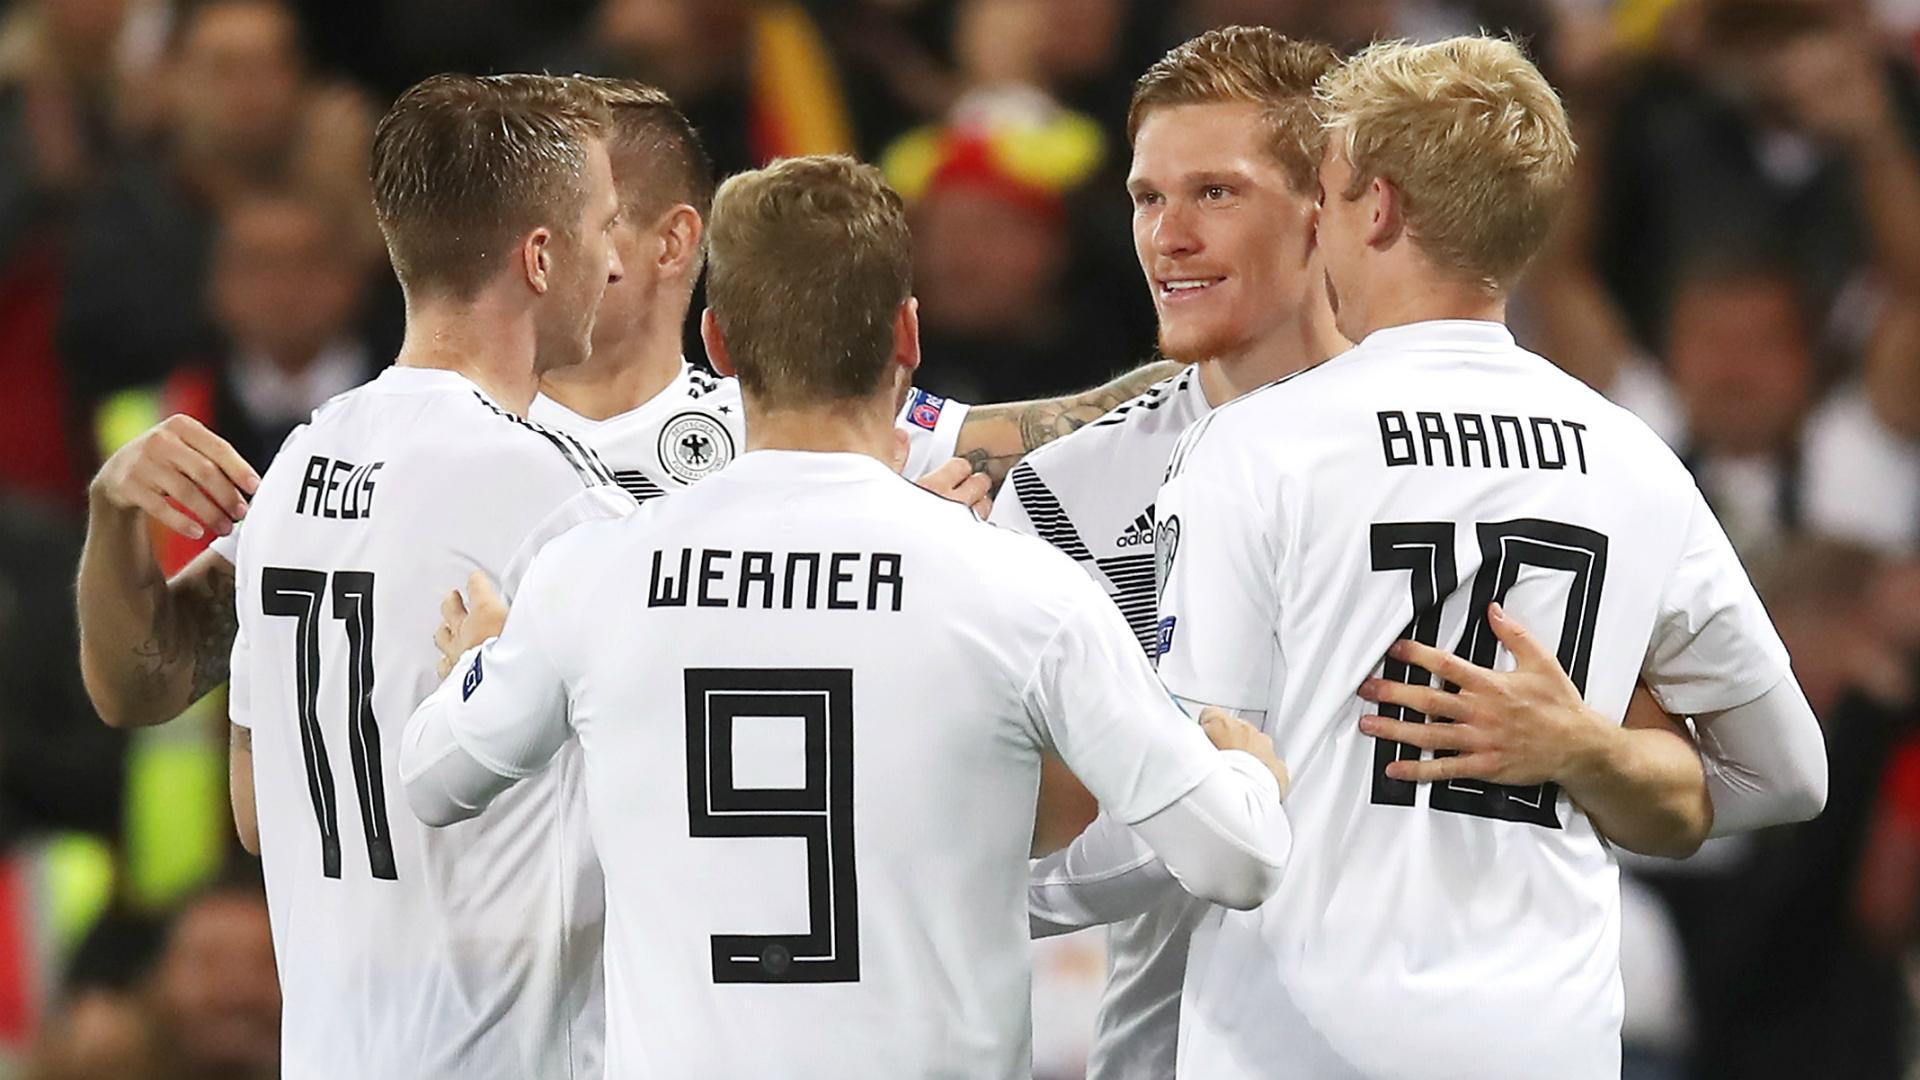 Northern Ireland 0-2 Germany: Halstenberg stunner breaks Windsor Park resistance